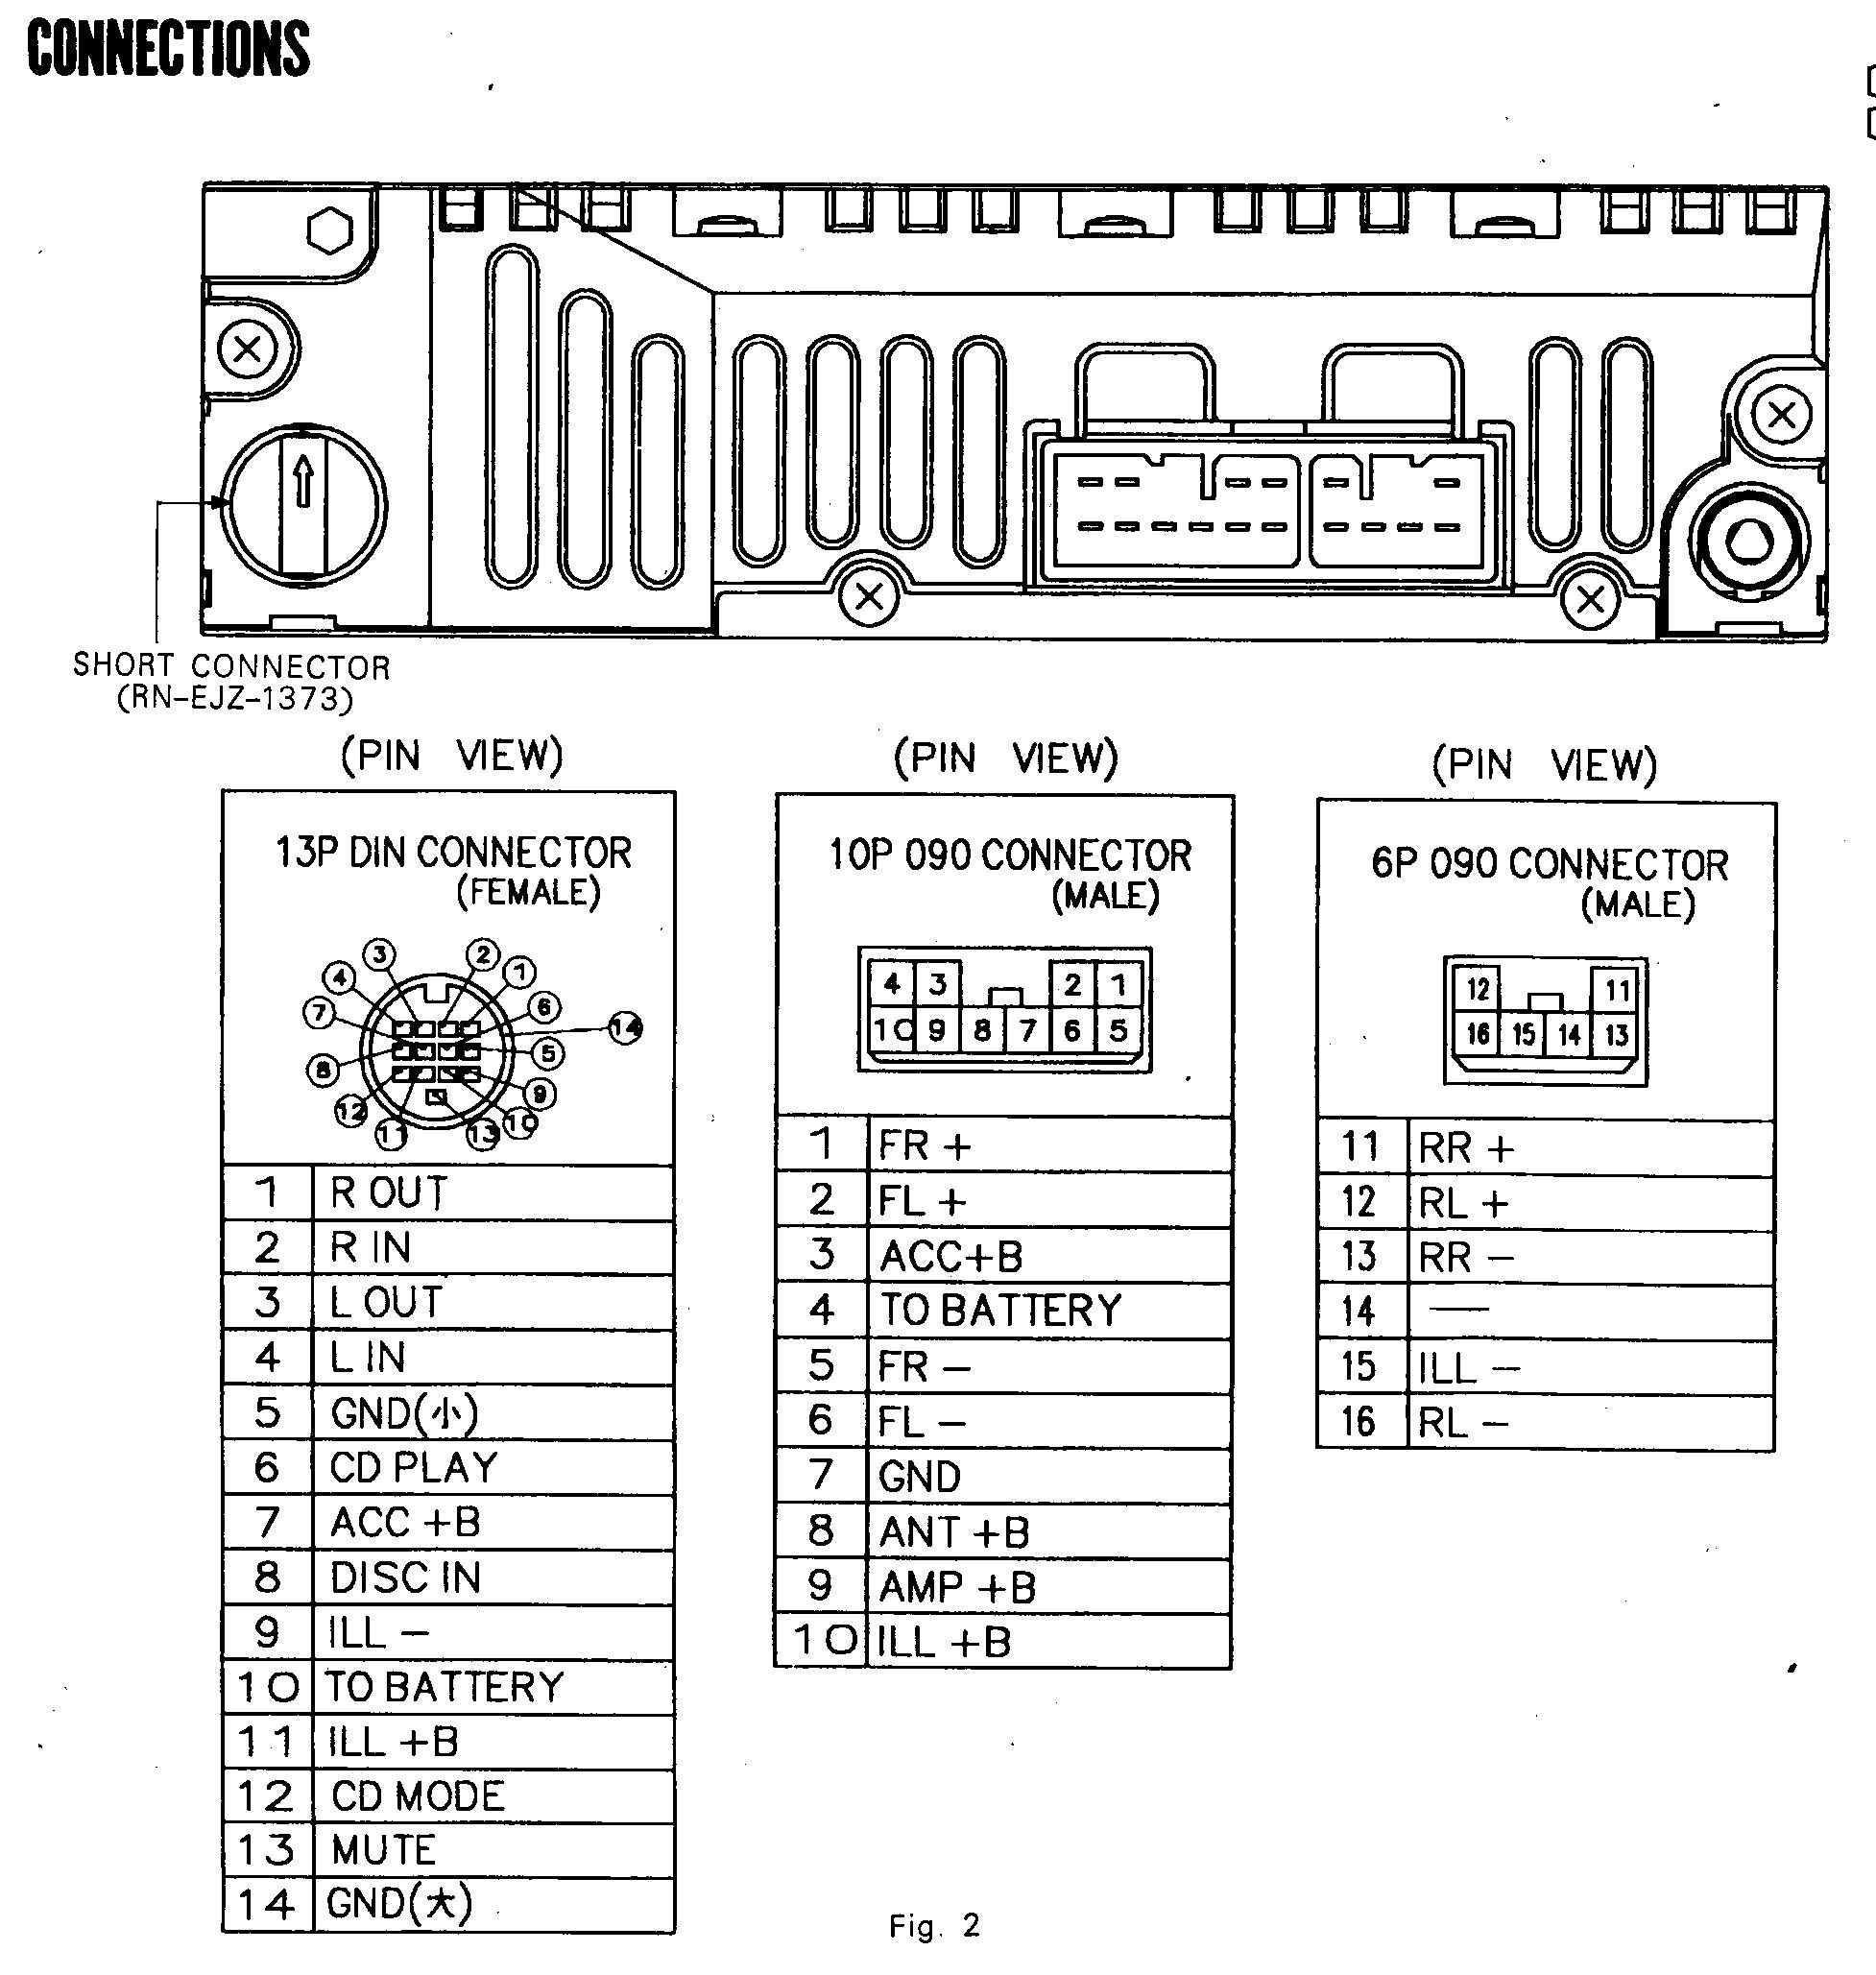 hight resolution of mazda 3 stereo wiring diagram free wiring diagram 2011 mazda 3 fuse box diagram 2011 mazda 3 i wiring diagram